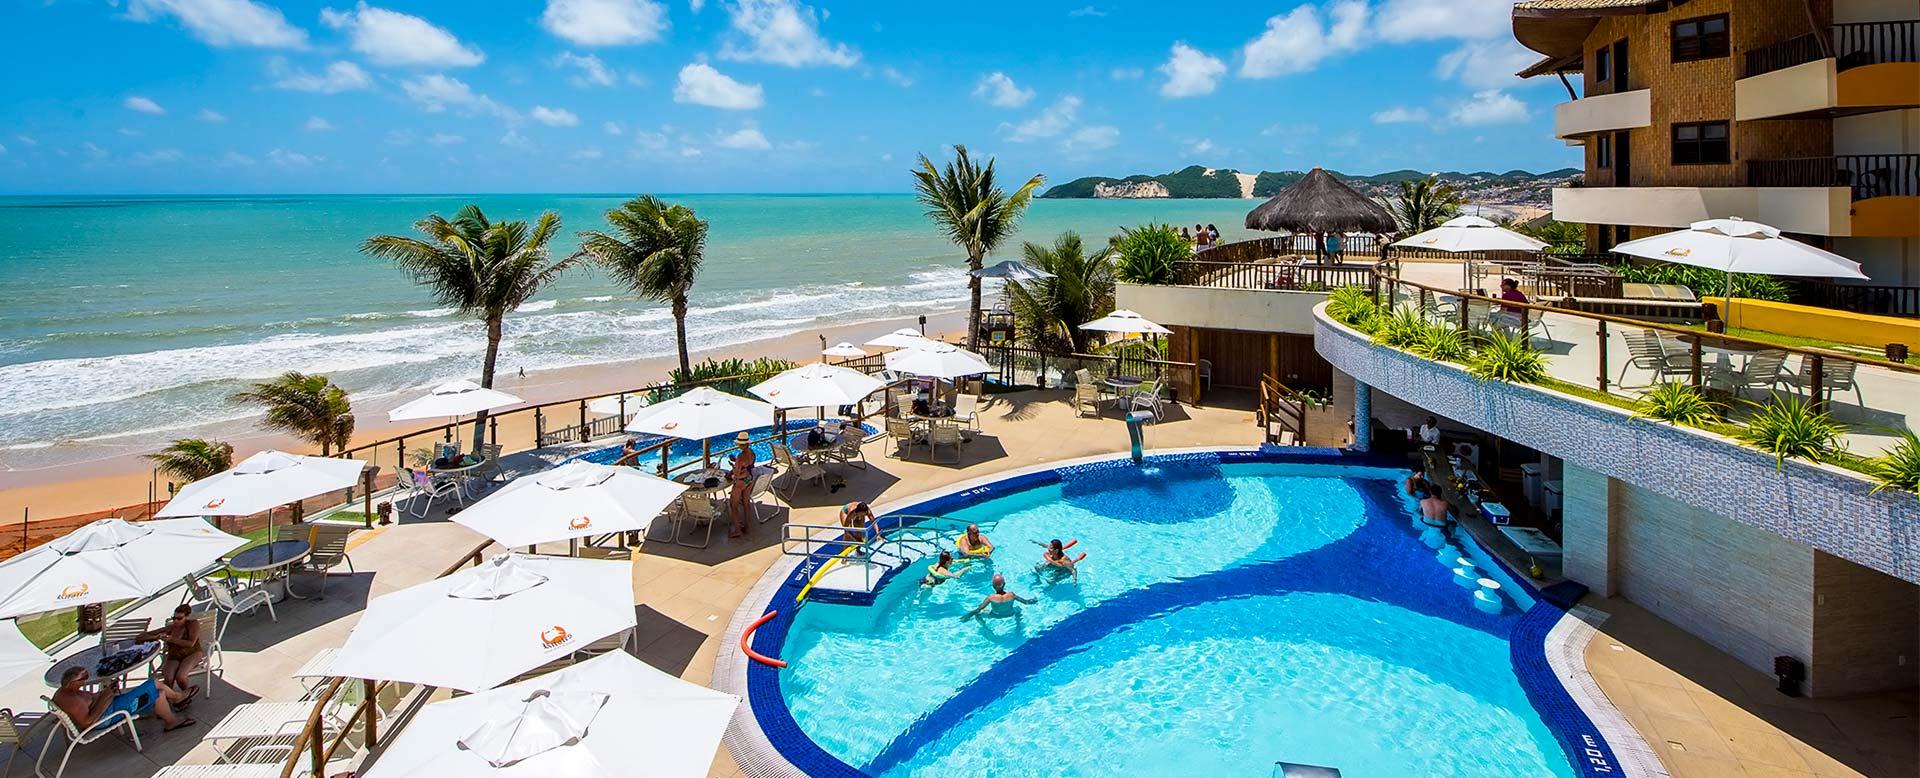 slider-page-rifoles-praia-hotel-e-resort-lazer-morro-do-careca